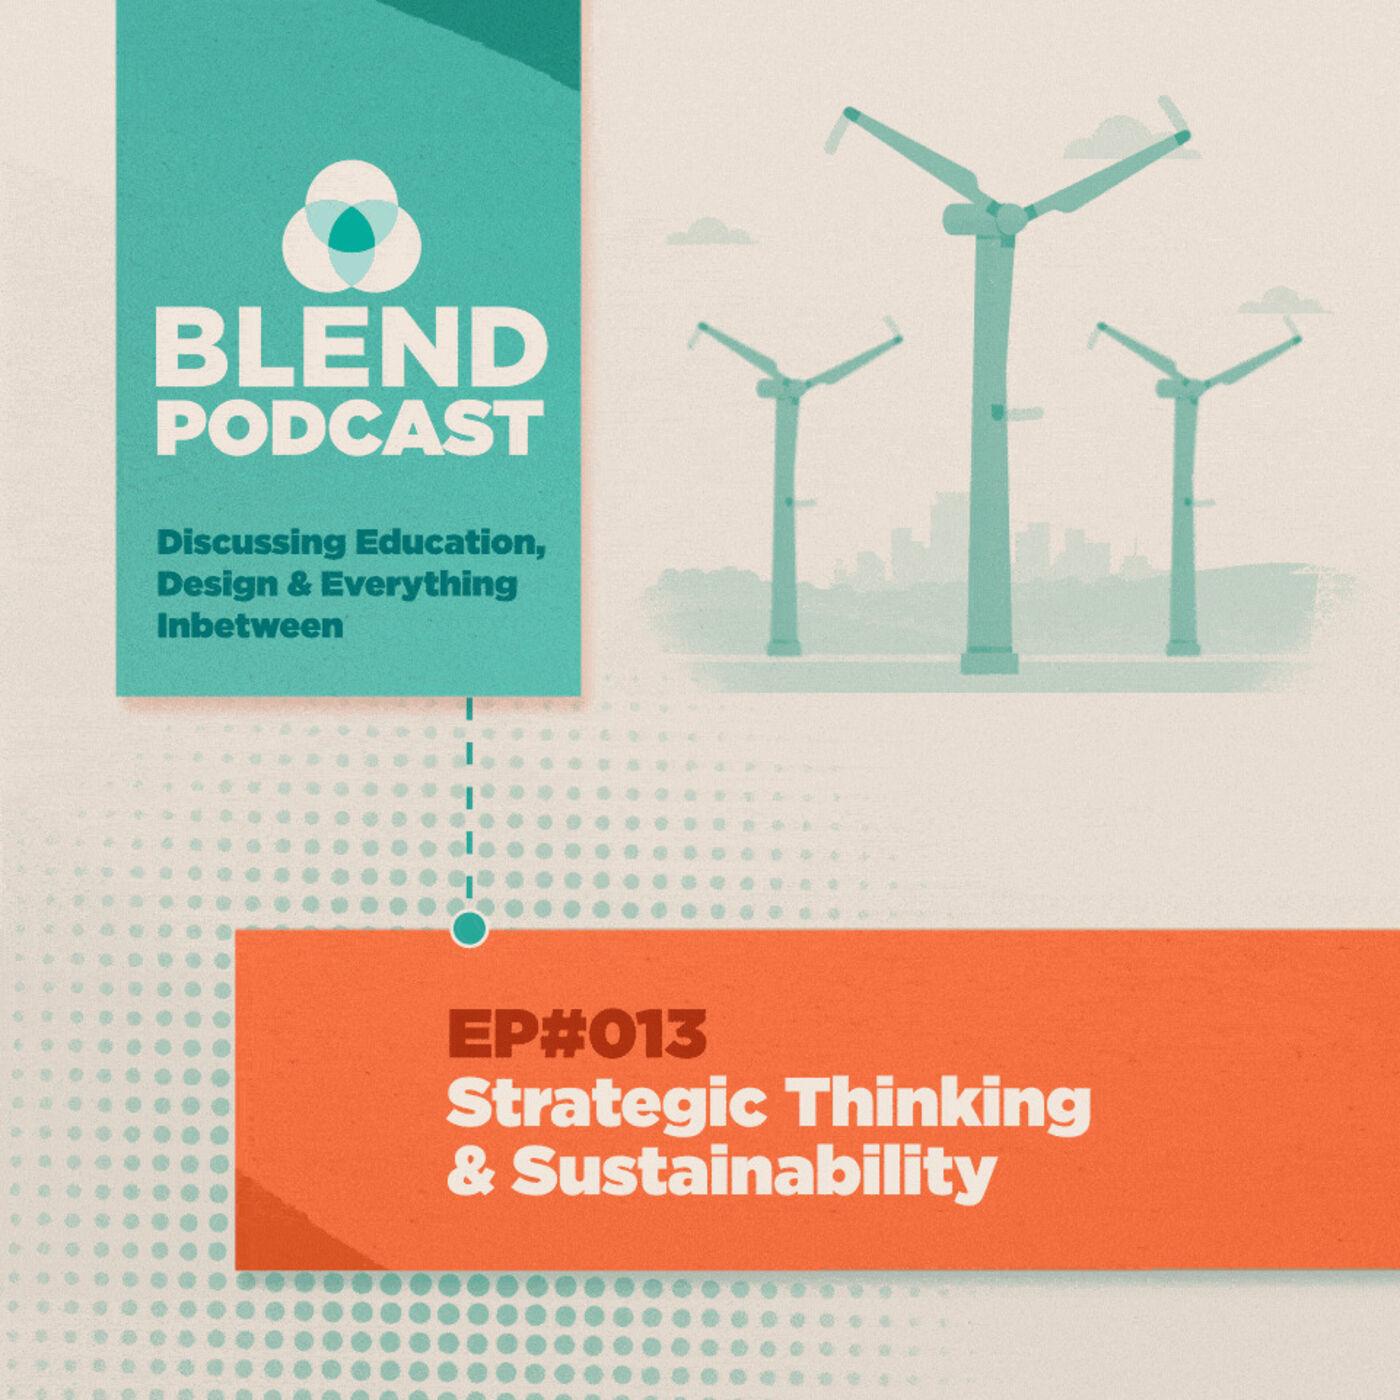 #13 Strategy & Sustainability